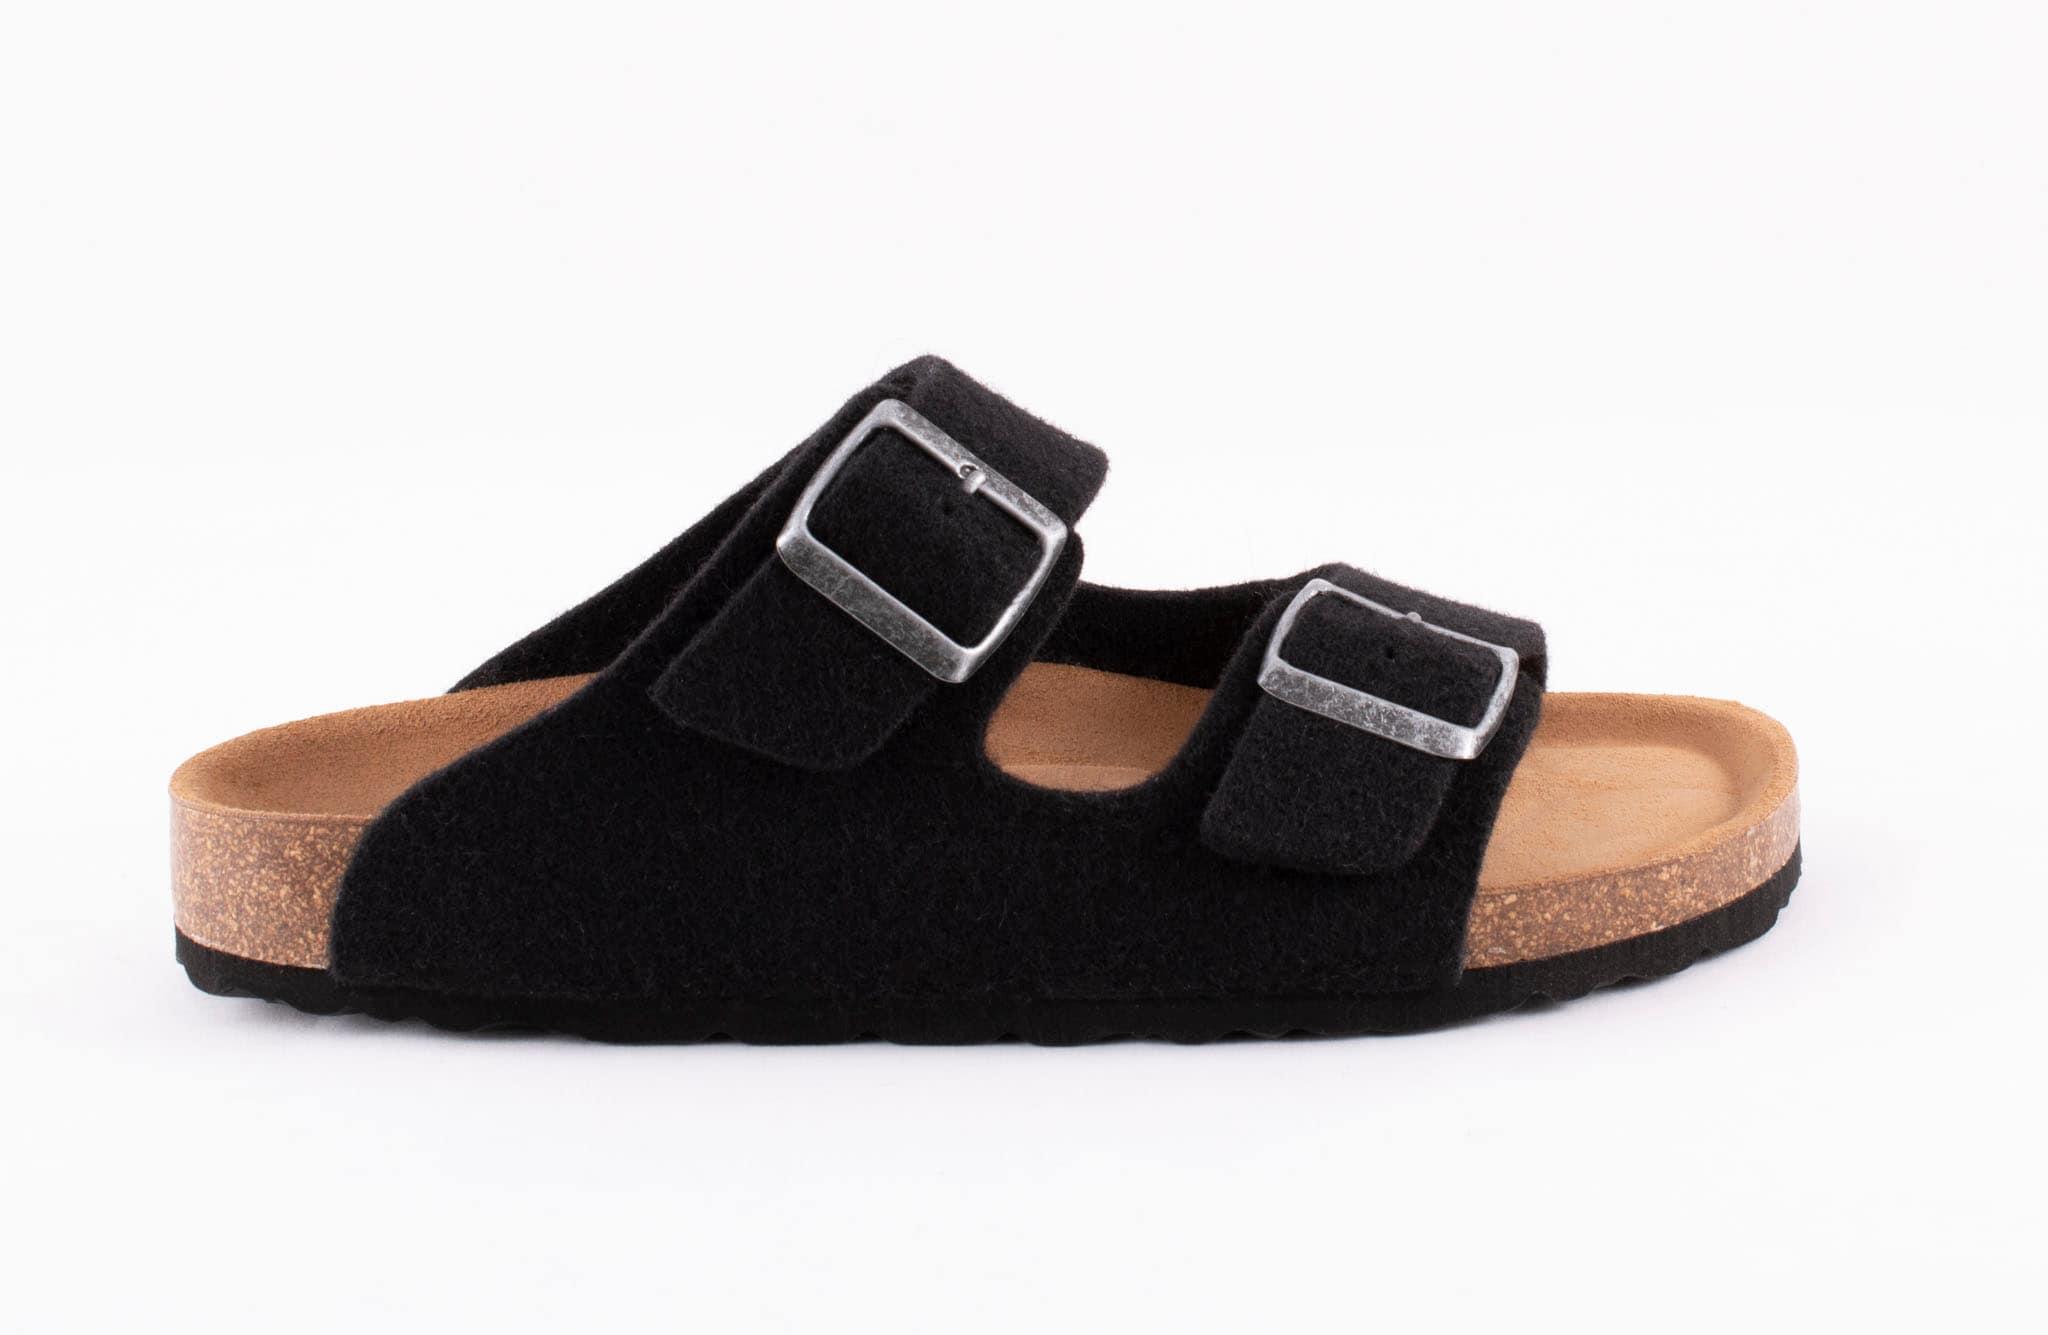 Shepherd Mikael sandals